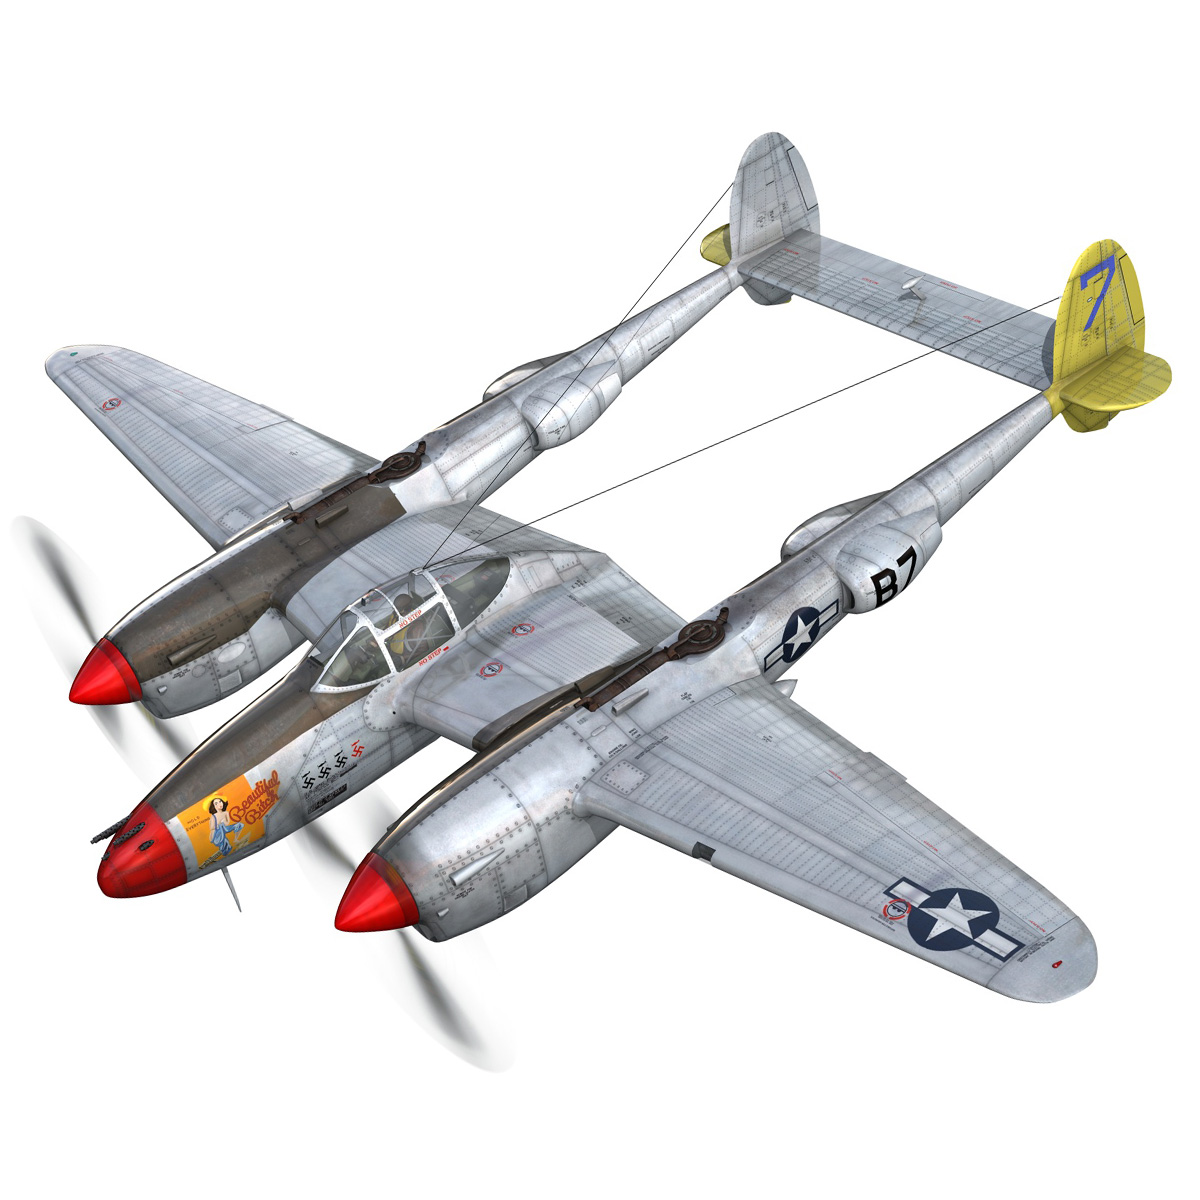 lockheed p-38 lightning – beautiful bitch 3d model fbx c4d lwo obj 272665